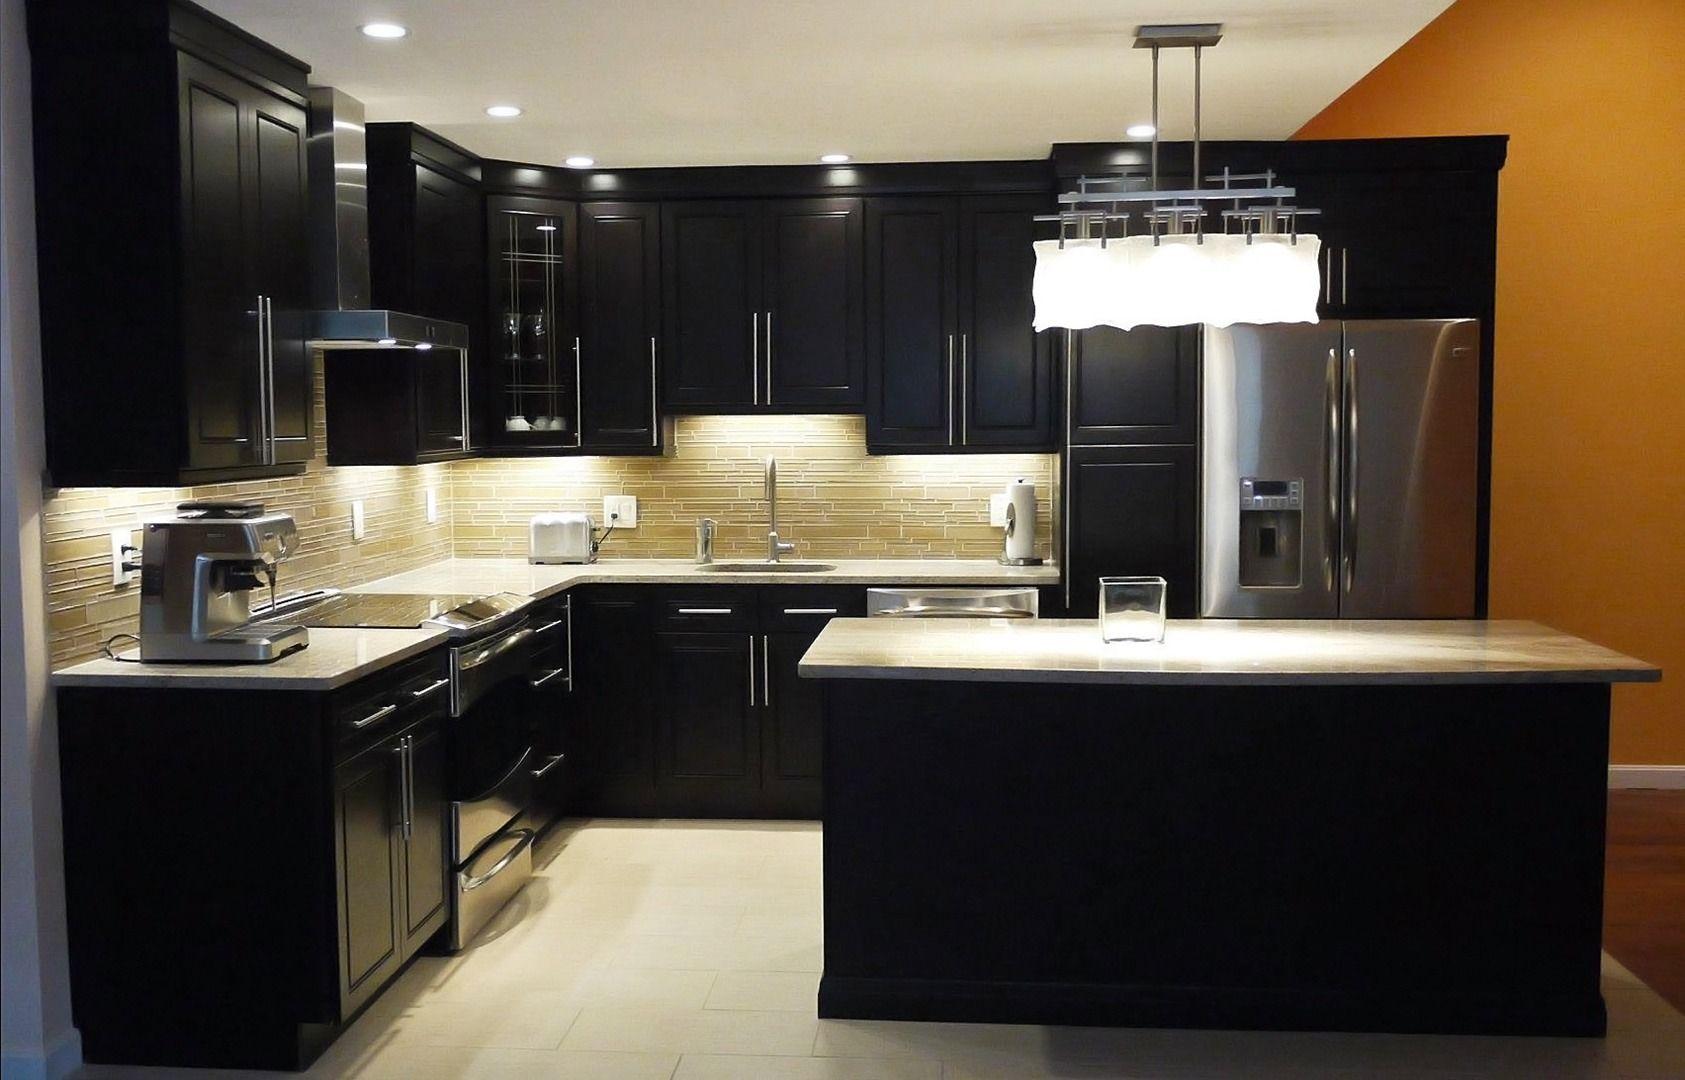 httpkitchencabinetandstonecomsollid cabinetry remodeling showroom scottsdale az kitchen cabinets pinterest. Interior Design Ideas. Home Design Ideas